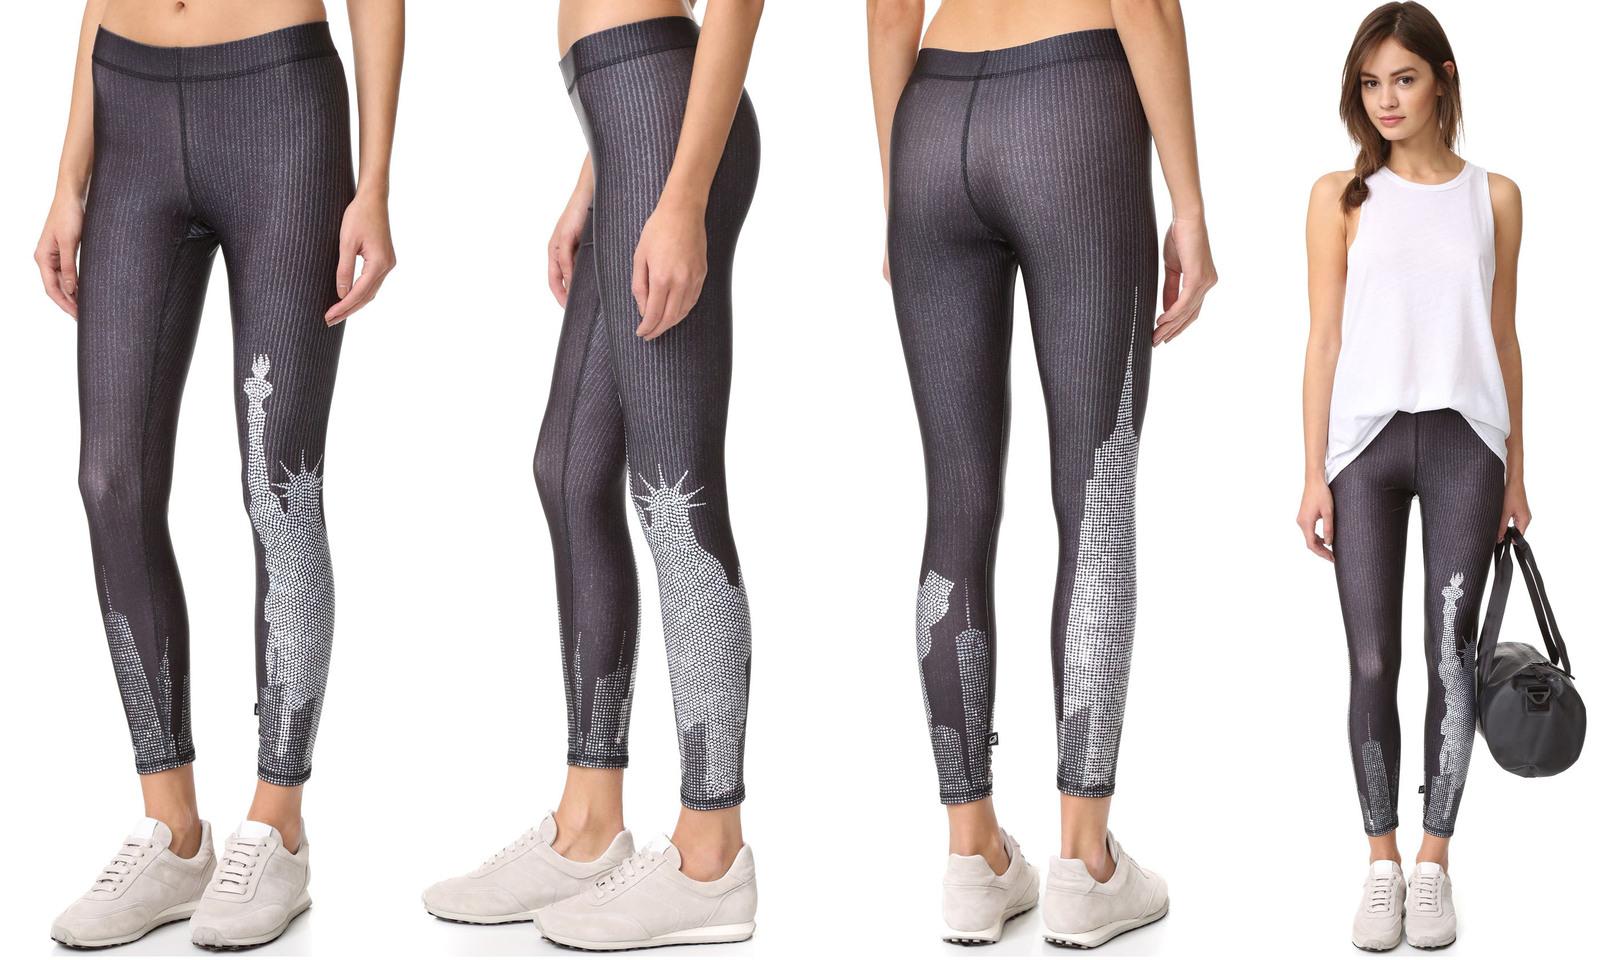 bca5adde93 Terez Women Crystal NY Skyline Performance Leggings- WM-ACT Activewear